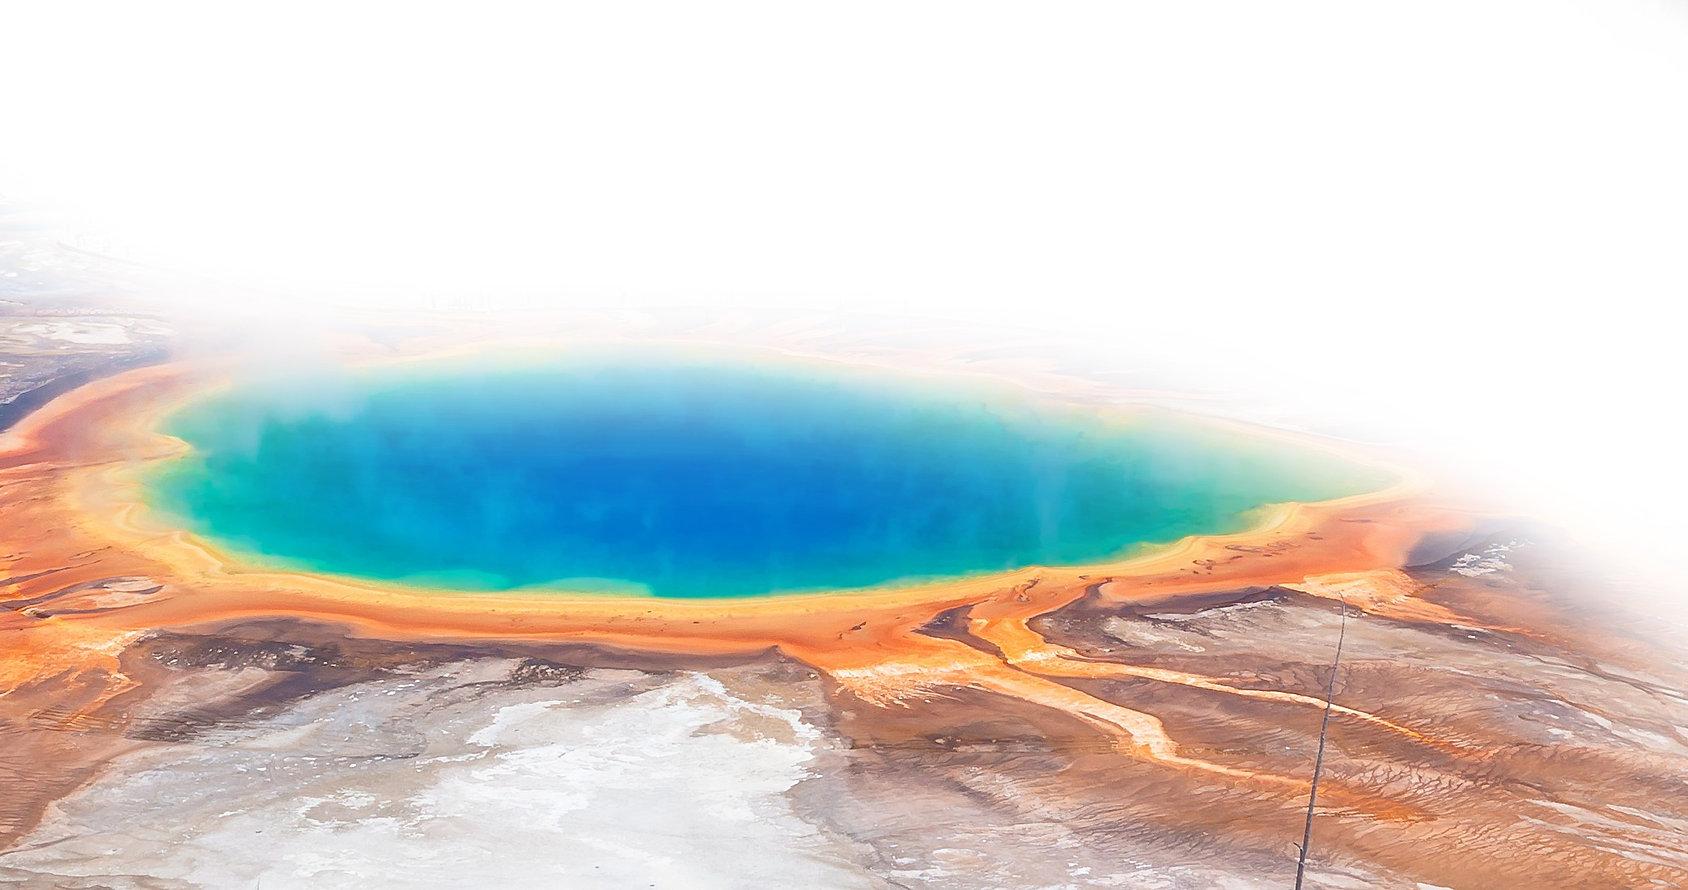 Gr Prismatic - YellowstonePicnicBaskets.